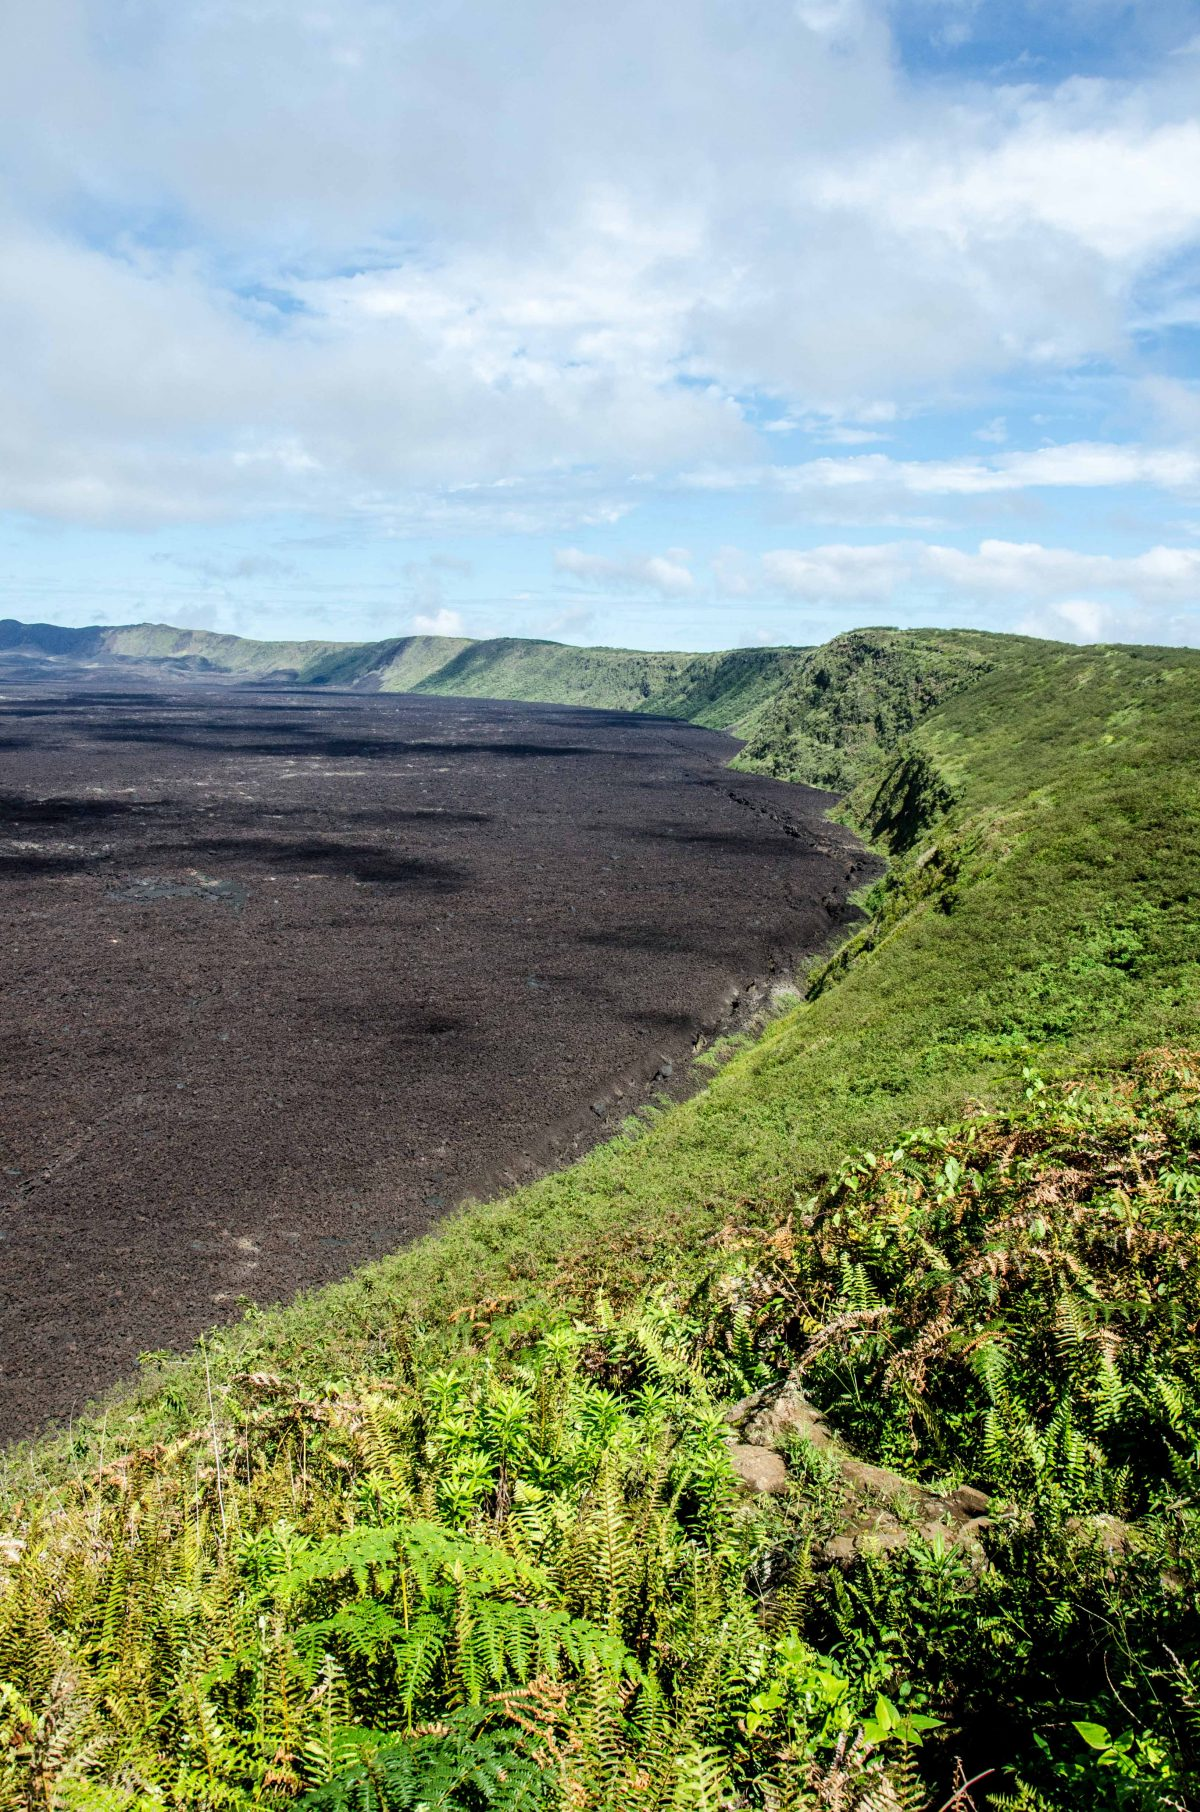 Volcan Sierra Negra, Isla Isabela, The Galapagos, Ecuador   ©Angela Drake / Not Your Average American